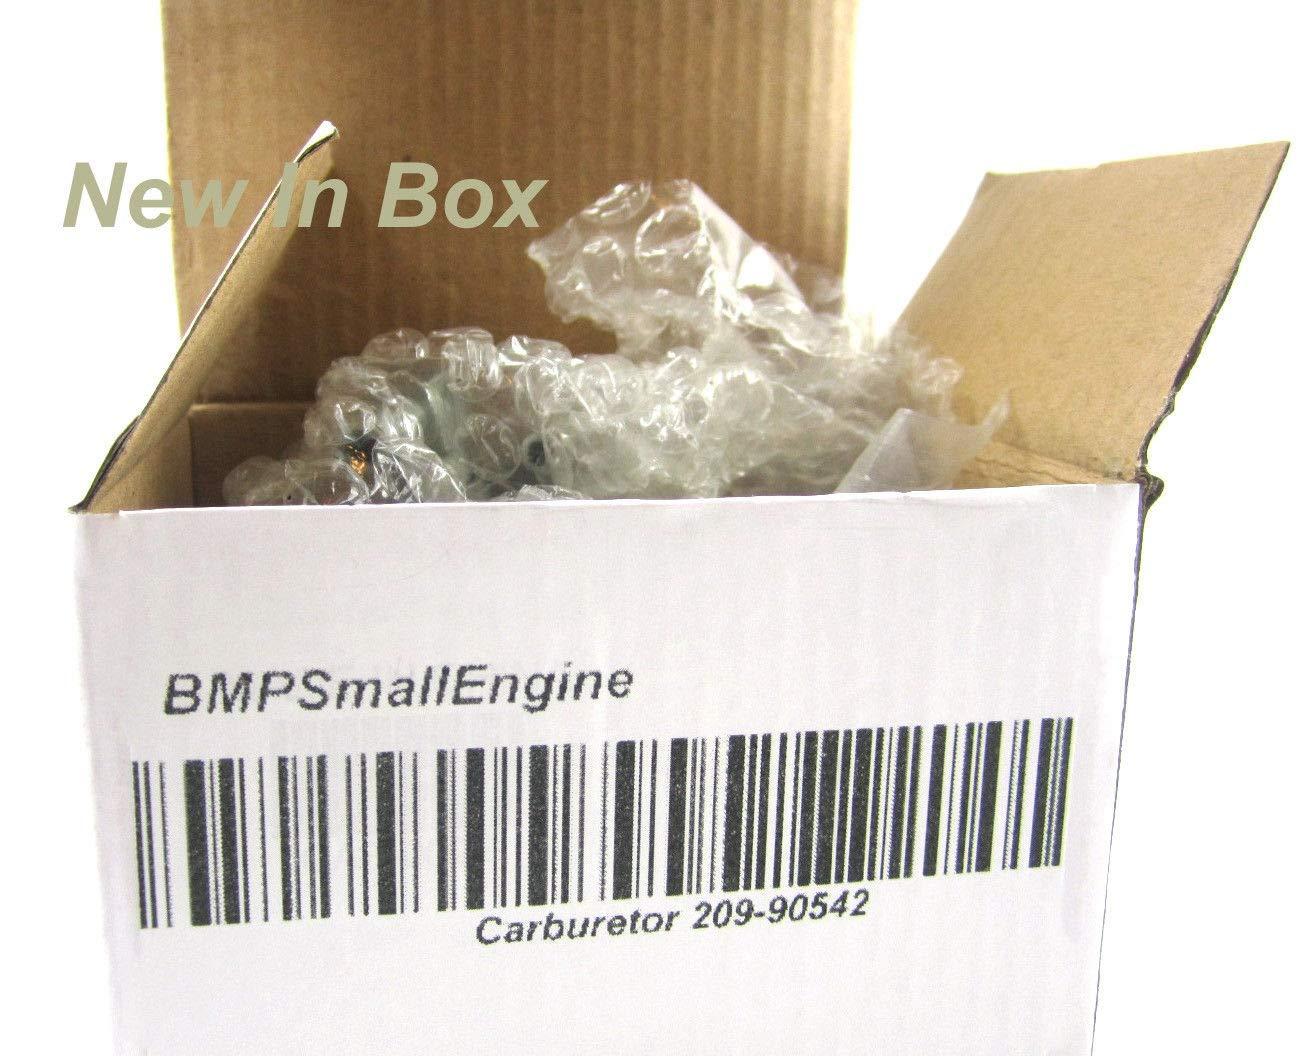 BMotorParts Carburetor Carb Assy. for Simplicity 1222EE Snow Thrower Model# 1696755 by BMotorParts